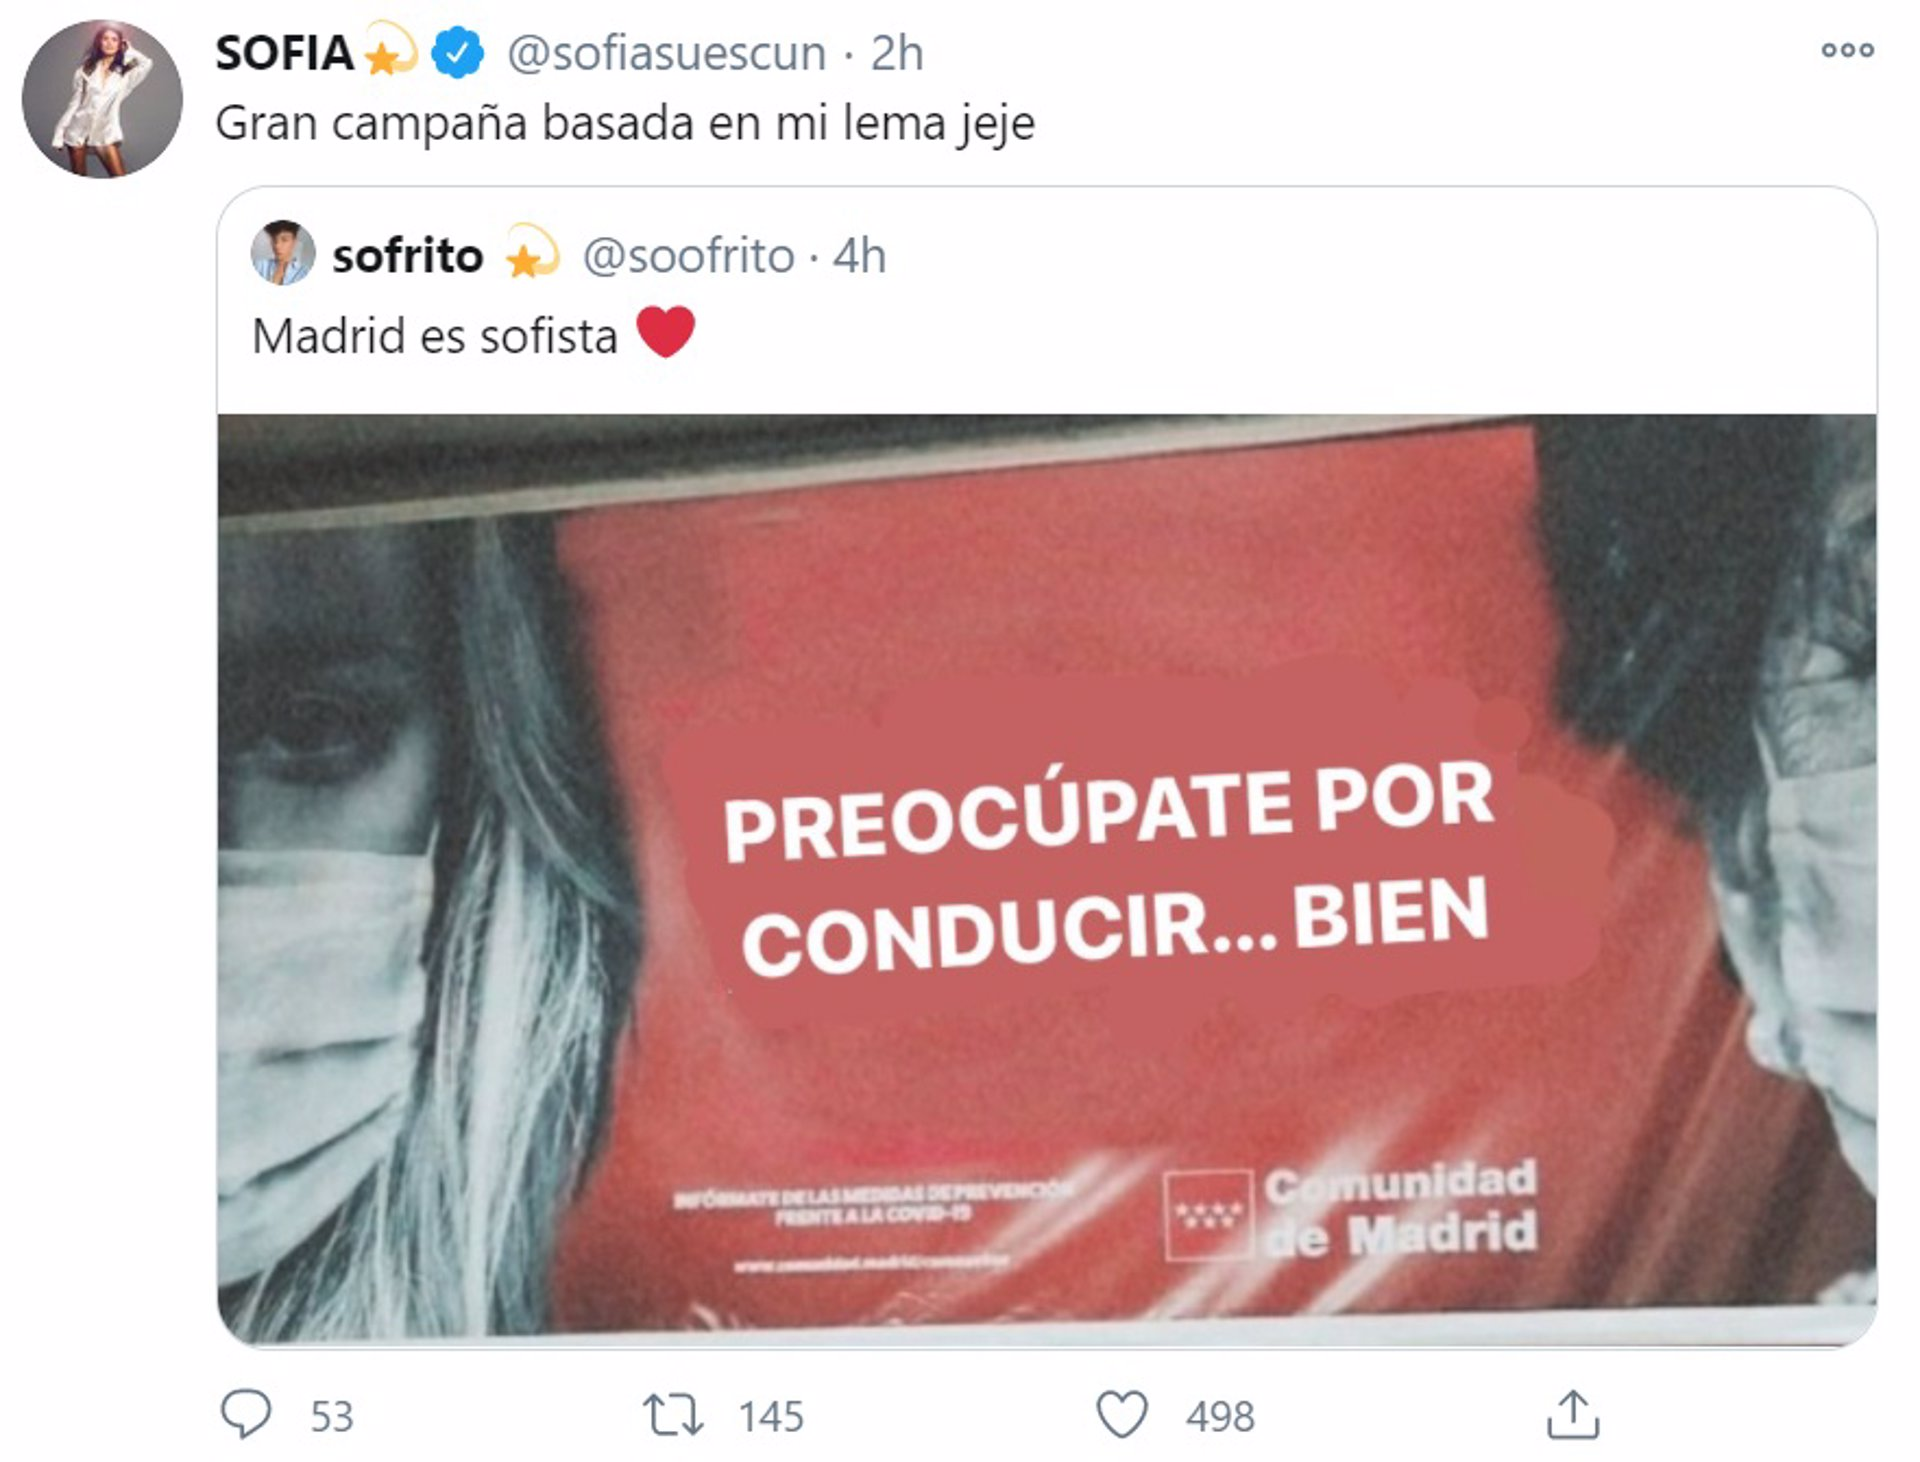 sofia-suescun-gloria-camila.jpg